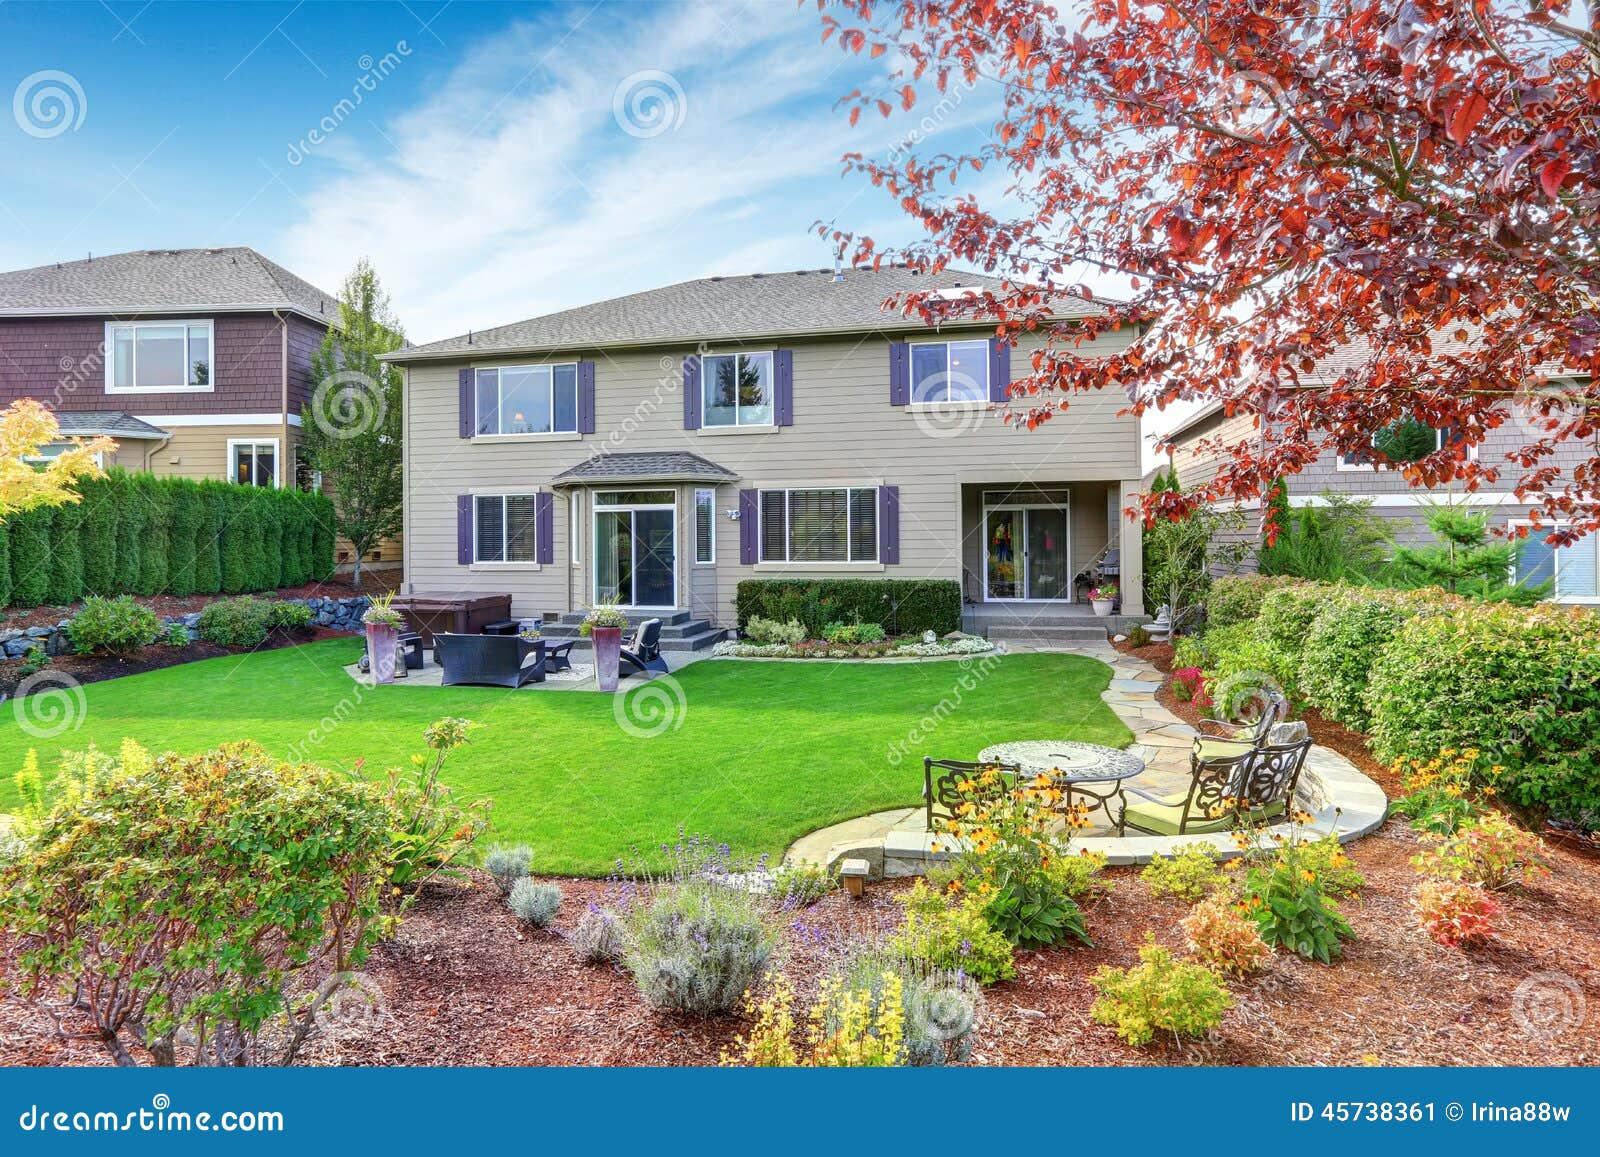 Luxury House Exterior With Impressive Backyard Landscape